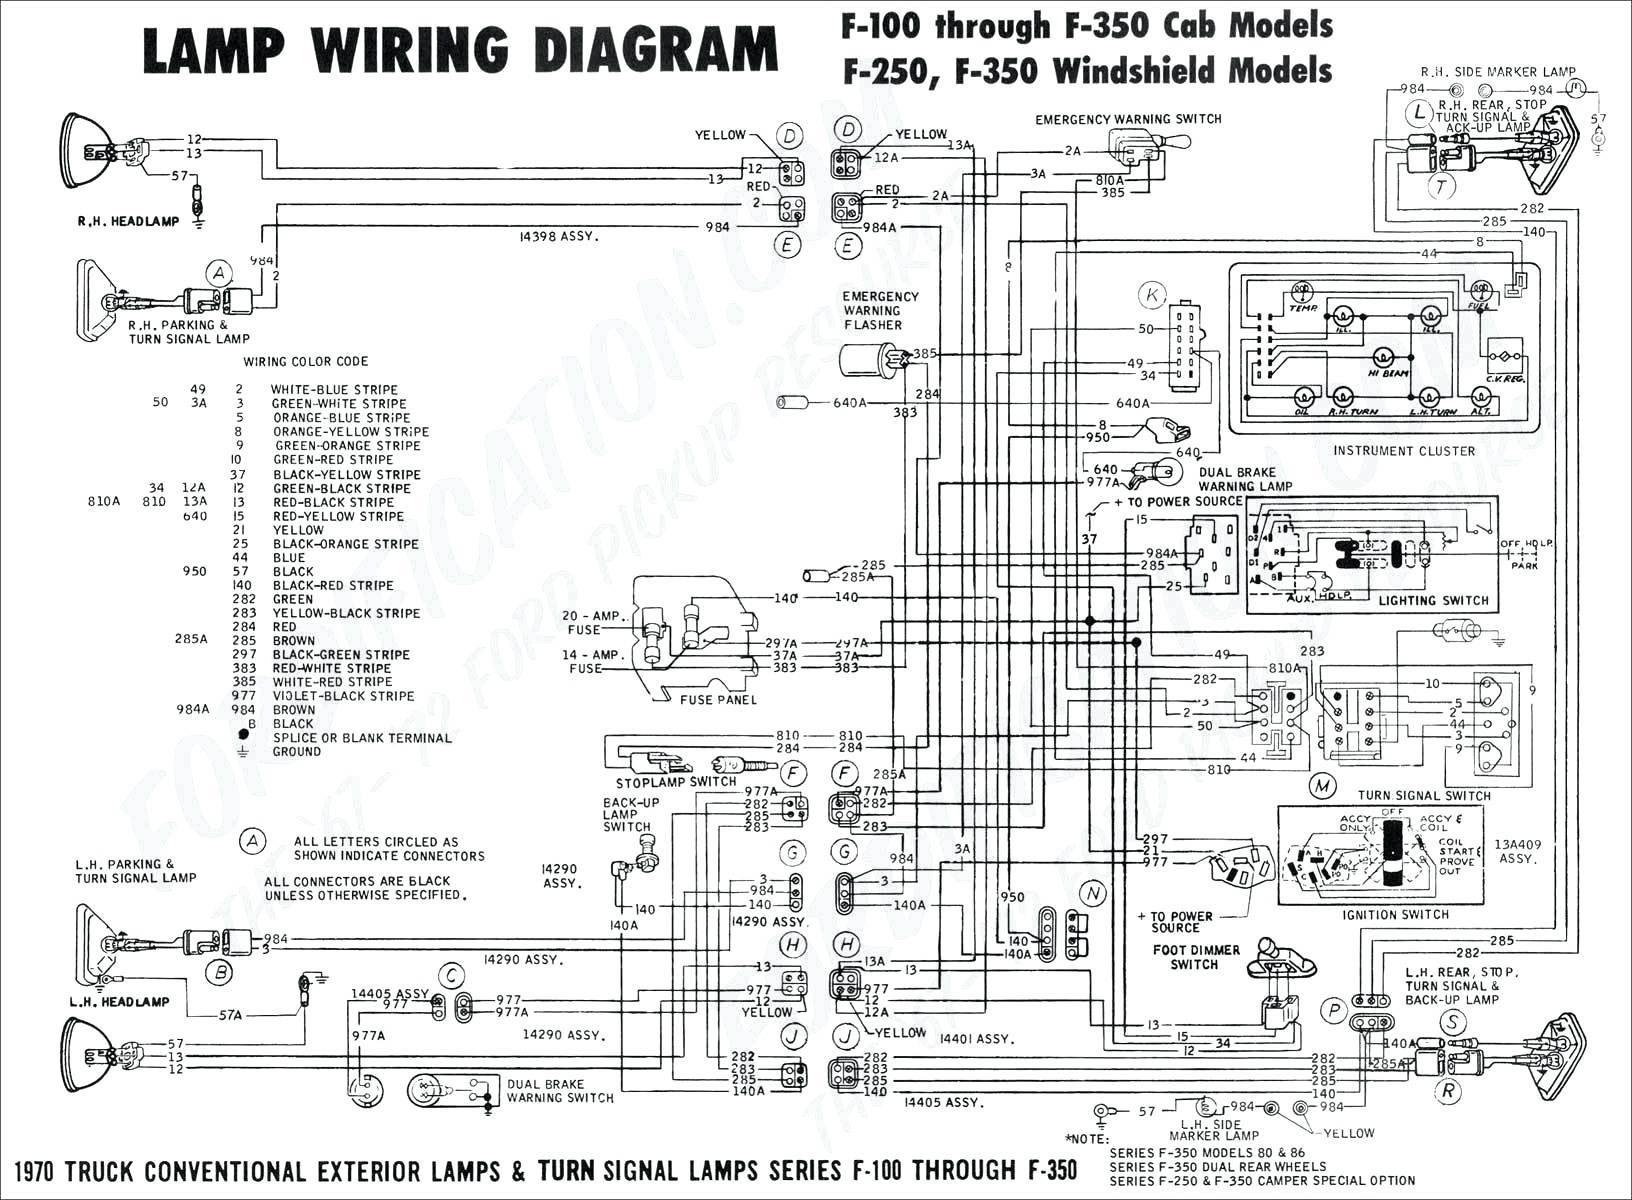 Chevy Truck Wiring Diagram Lights on 86 chevy truck drive shaft, 86 ford wiring diagram, 86 chevy truck brochure, chevy c10 starter wiring diagram, chevy silverado wiring diagram, 86 jeep wiring diagram, 1987 chevy 1500 wiring diagram, 86 chevy truck oil sending unit, 1986 chevy 350 engine diagram, 86 chevy truck neutral safety switch, 1980 chevy pickup wiring diagram, 86 lamborghini wiring diagram, 1978 toyota pickup wiring diagram, 1986 chevy 305 engine diagram, 86 toyota supra wiring diagram, 86 chevy truck rear suspension, 1964 chevy pickup wiring diagram, 86 chevy truck wheels, 1998 chevy 3500 wiring diagram, painless gm column wiring diagram,